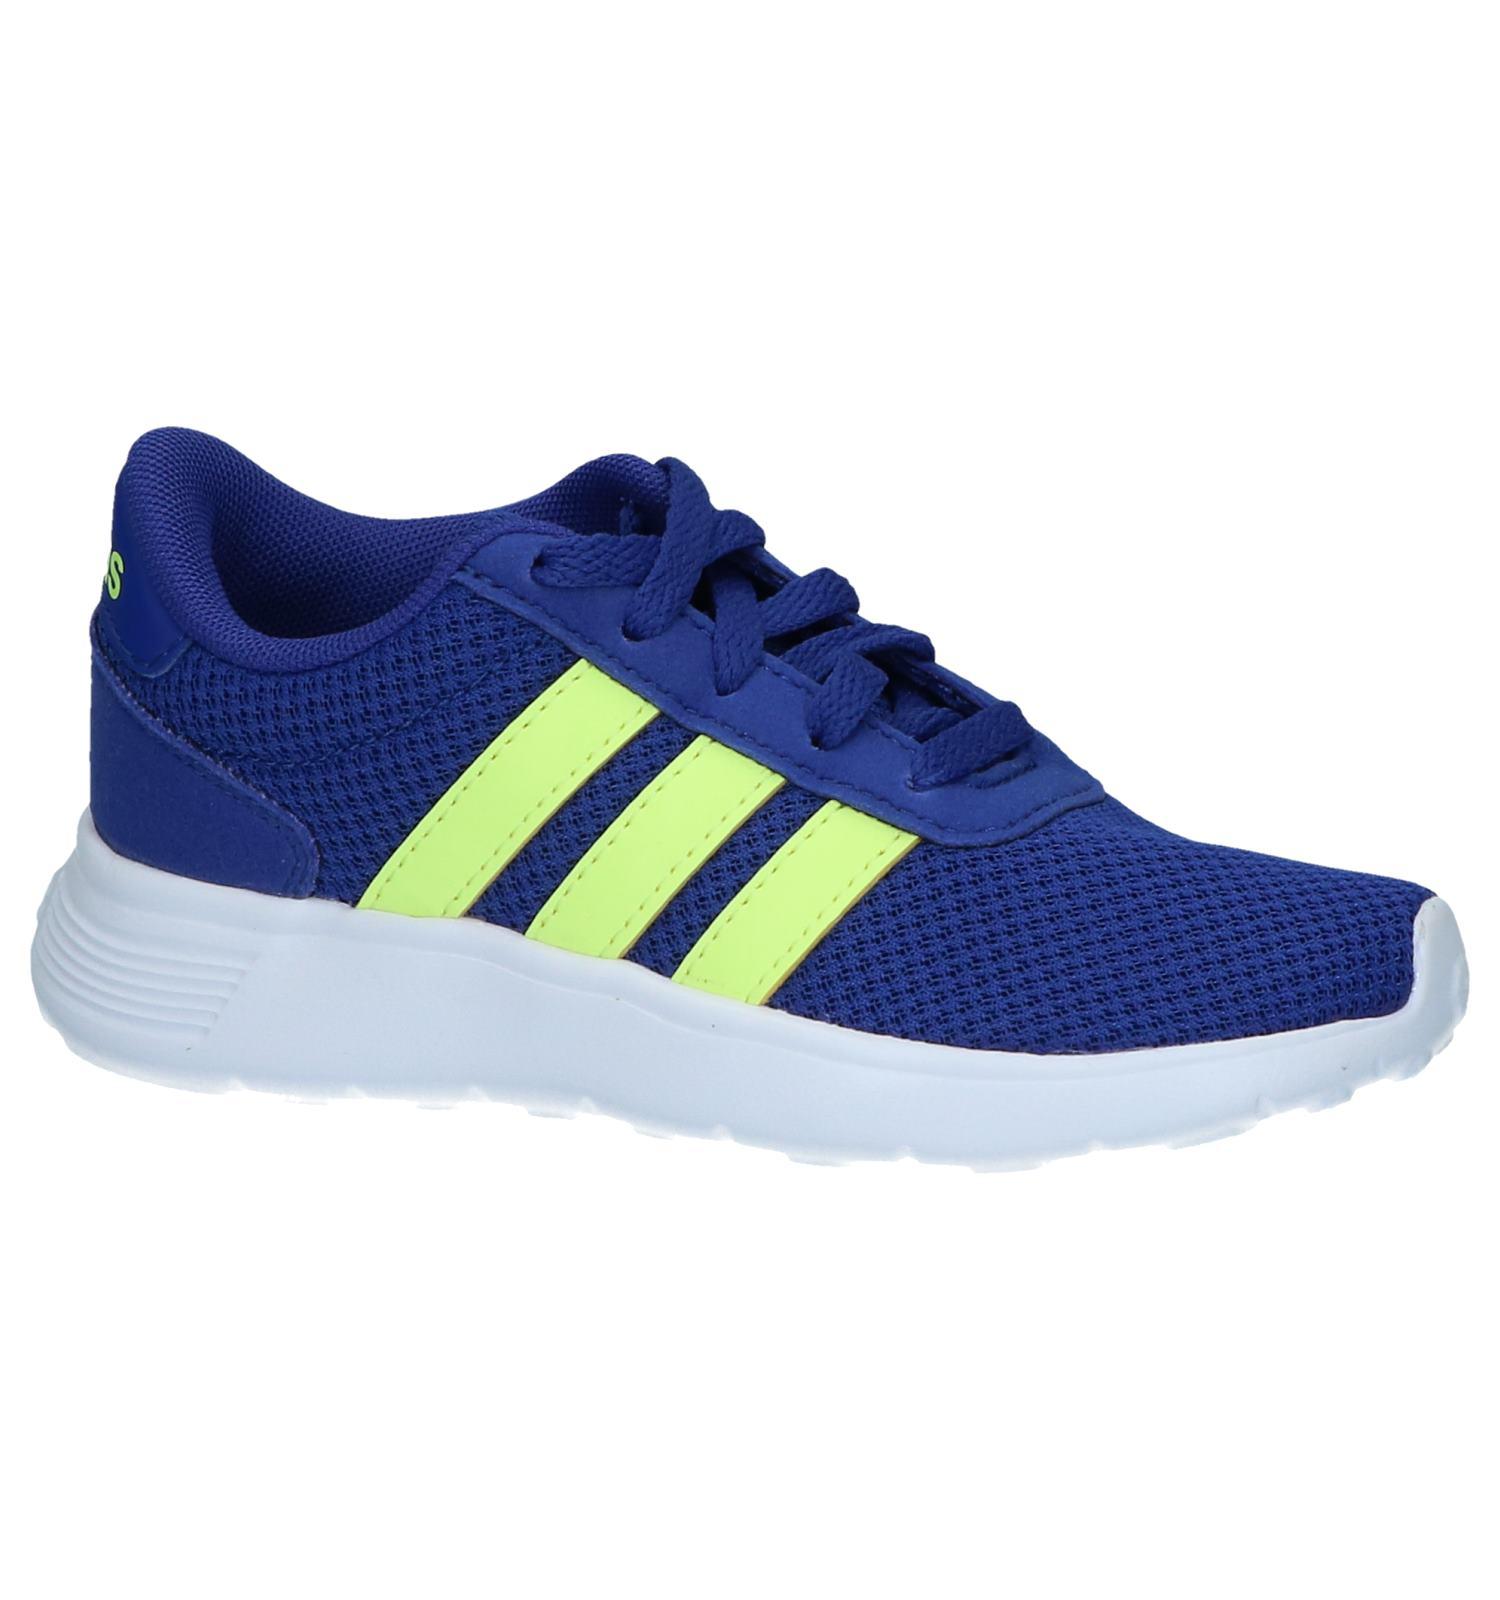 Blauwe Sneakers Adidas Lite Racer | TORFS.BE | Gratis verzend en retour